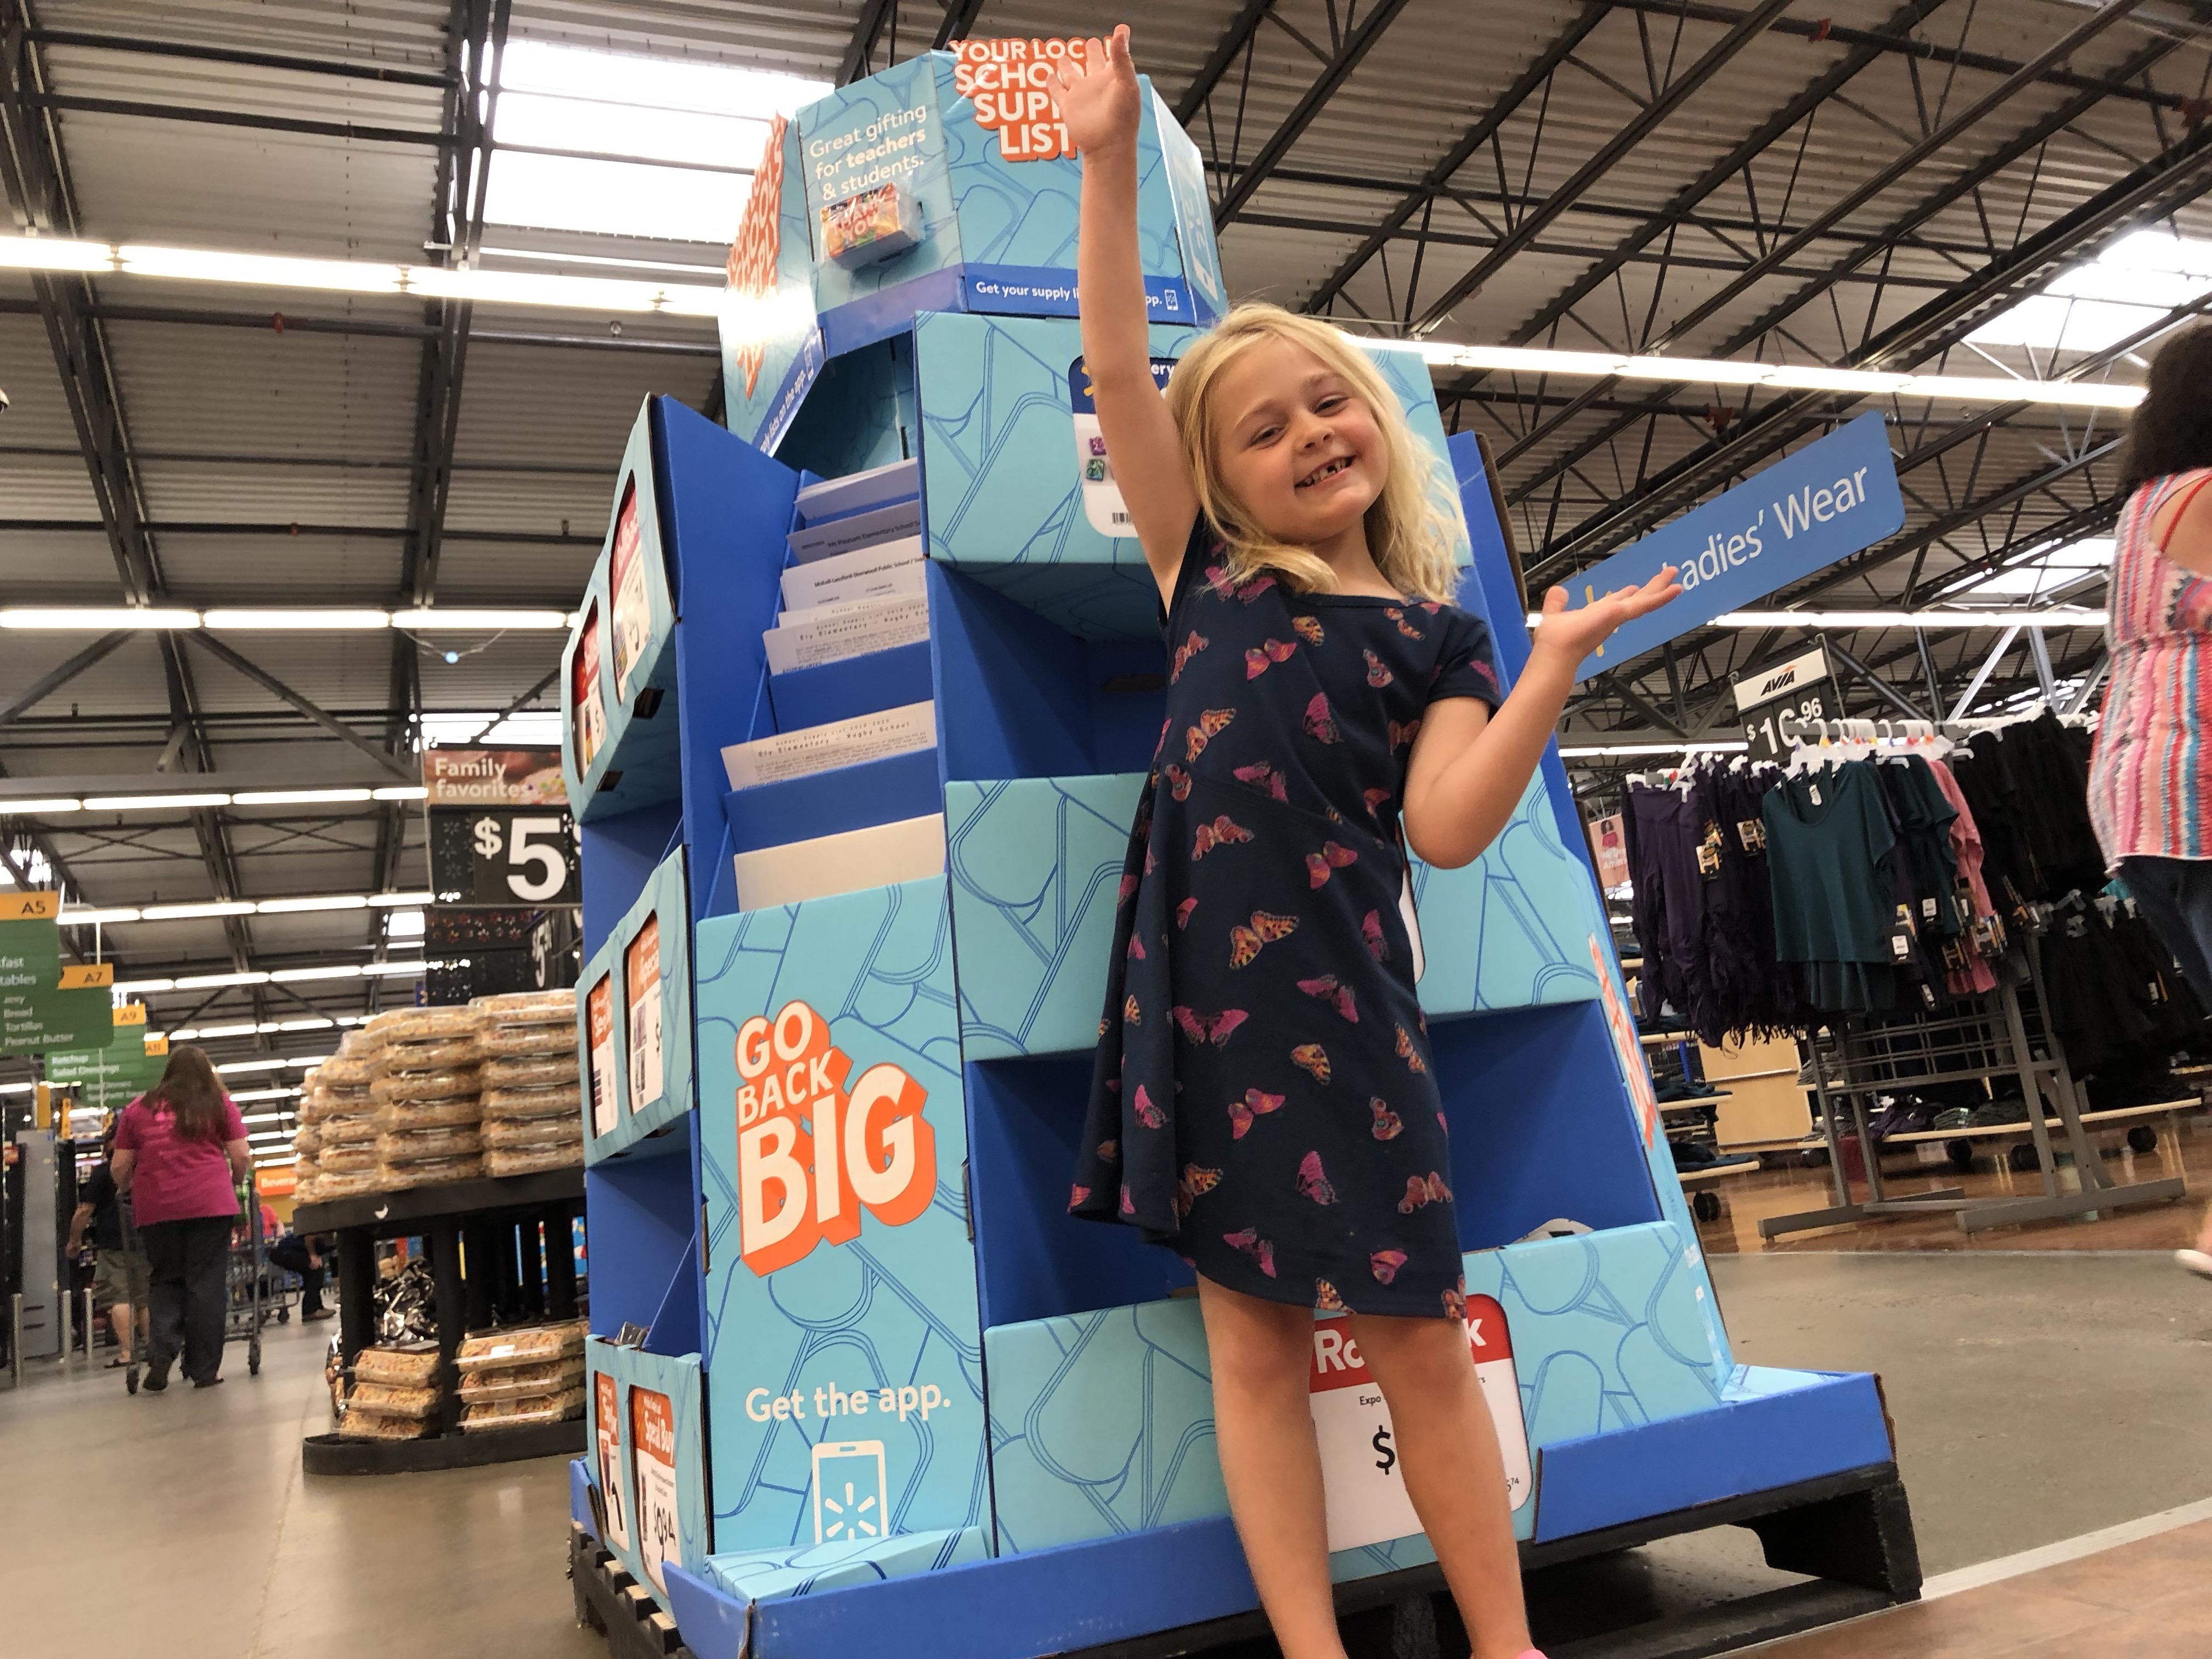 Kindergarten student stands in front of Go Back BIG sign at Walmart